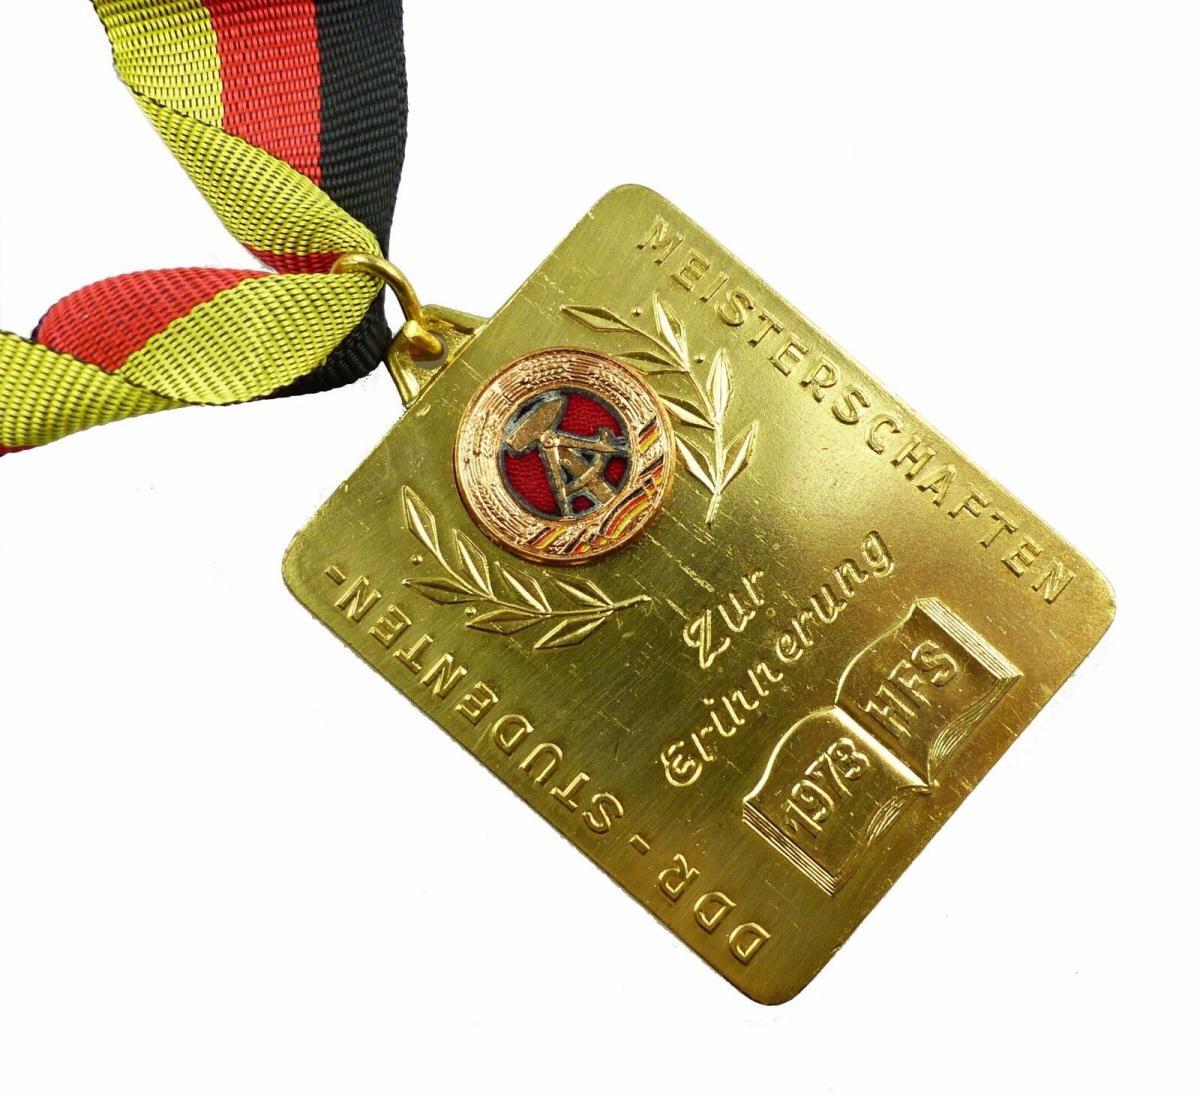 #e5946 Medaille DDR Studenten-Meisterschaften 1973 HFS Zur Erinnerung goldfarben